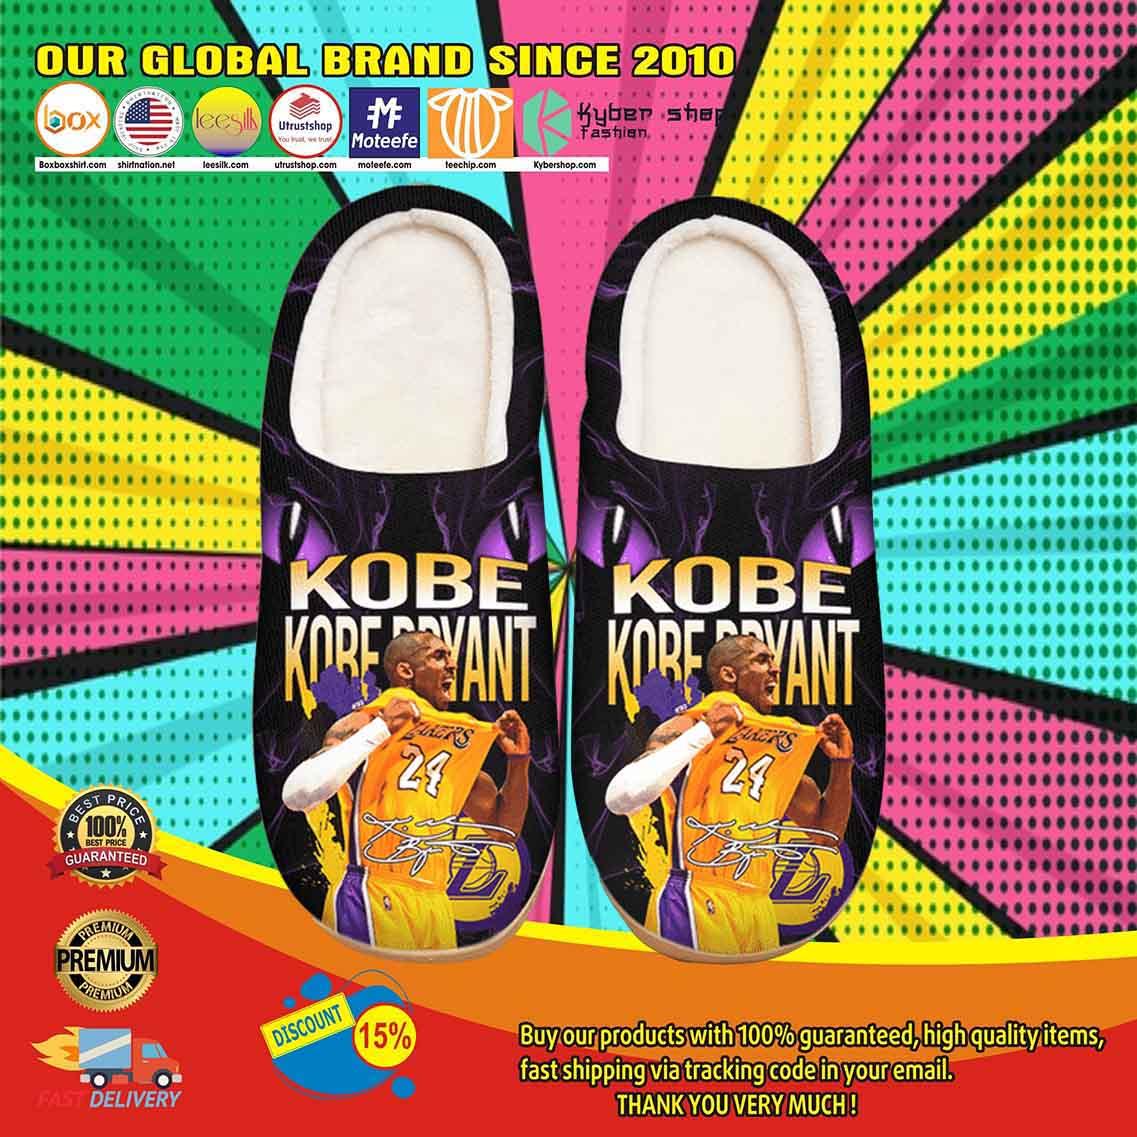 Kobe Bryant Custom Shoes Slippers 2